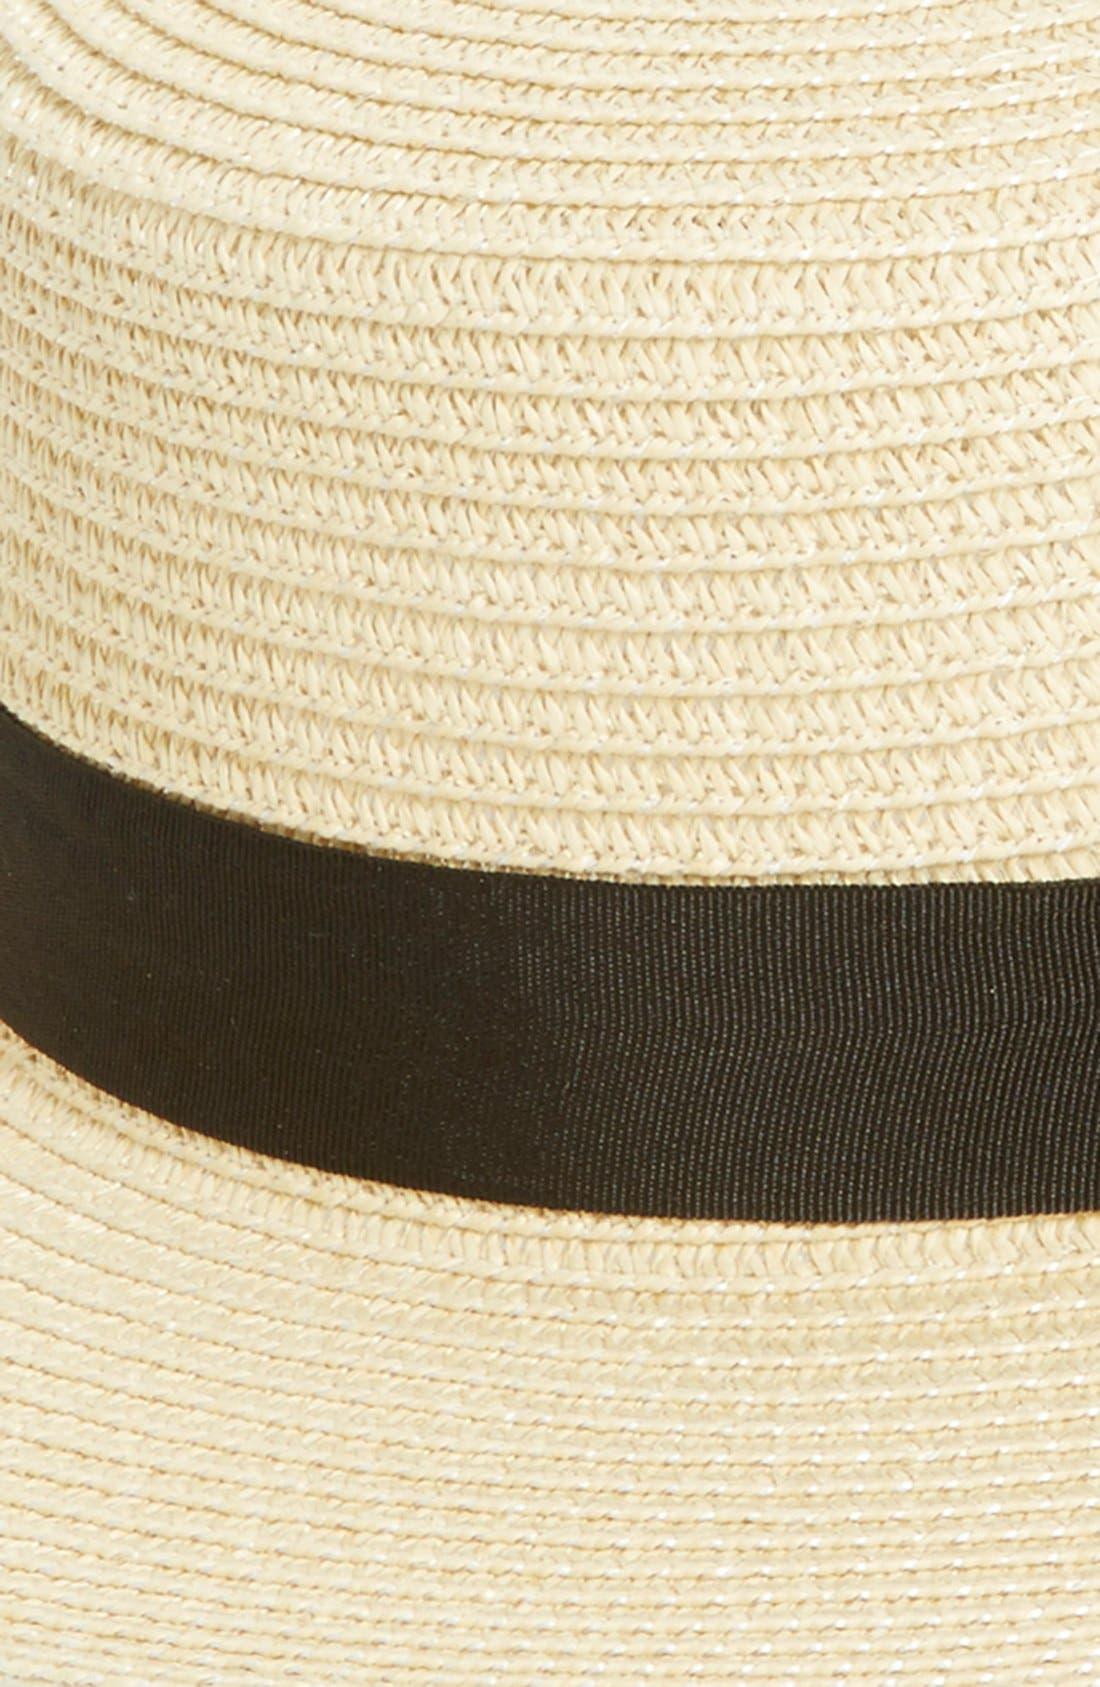 BP., Straw Boater Hat, Alternate thumbnail 2, color, 250